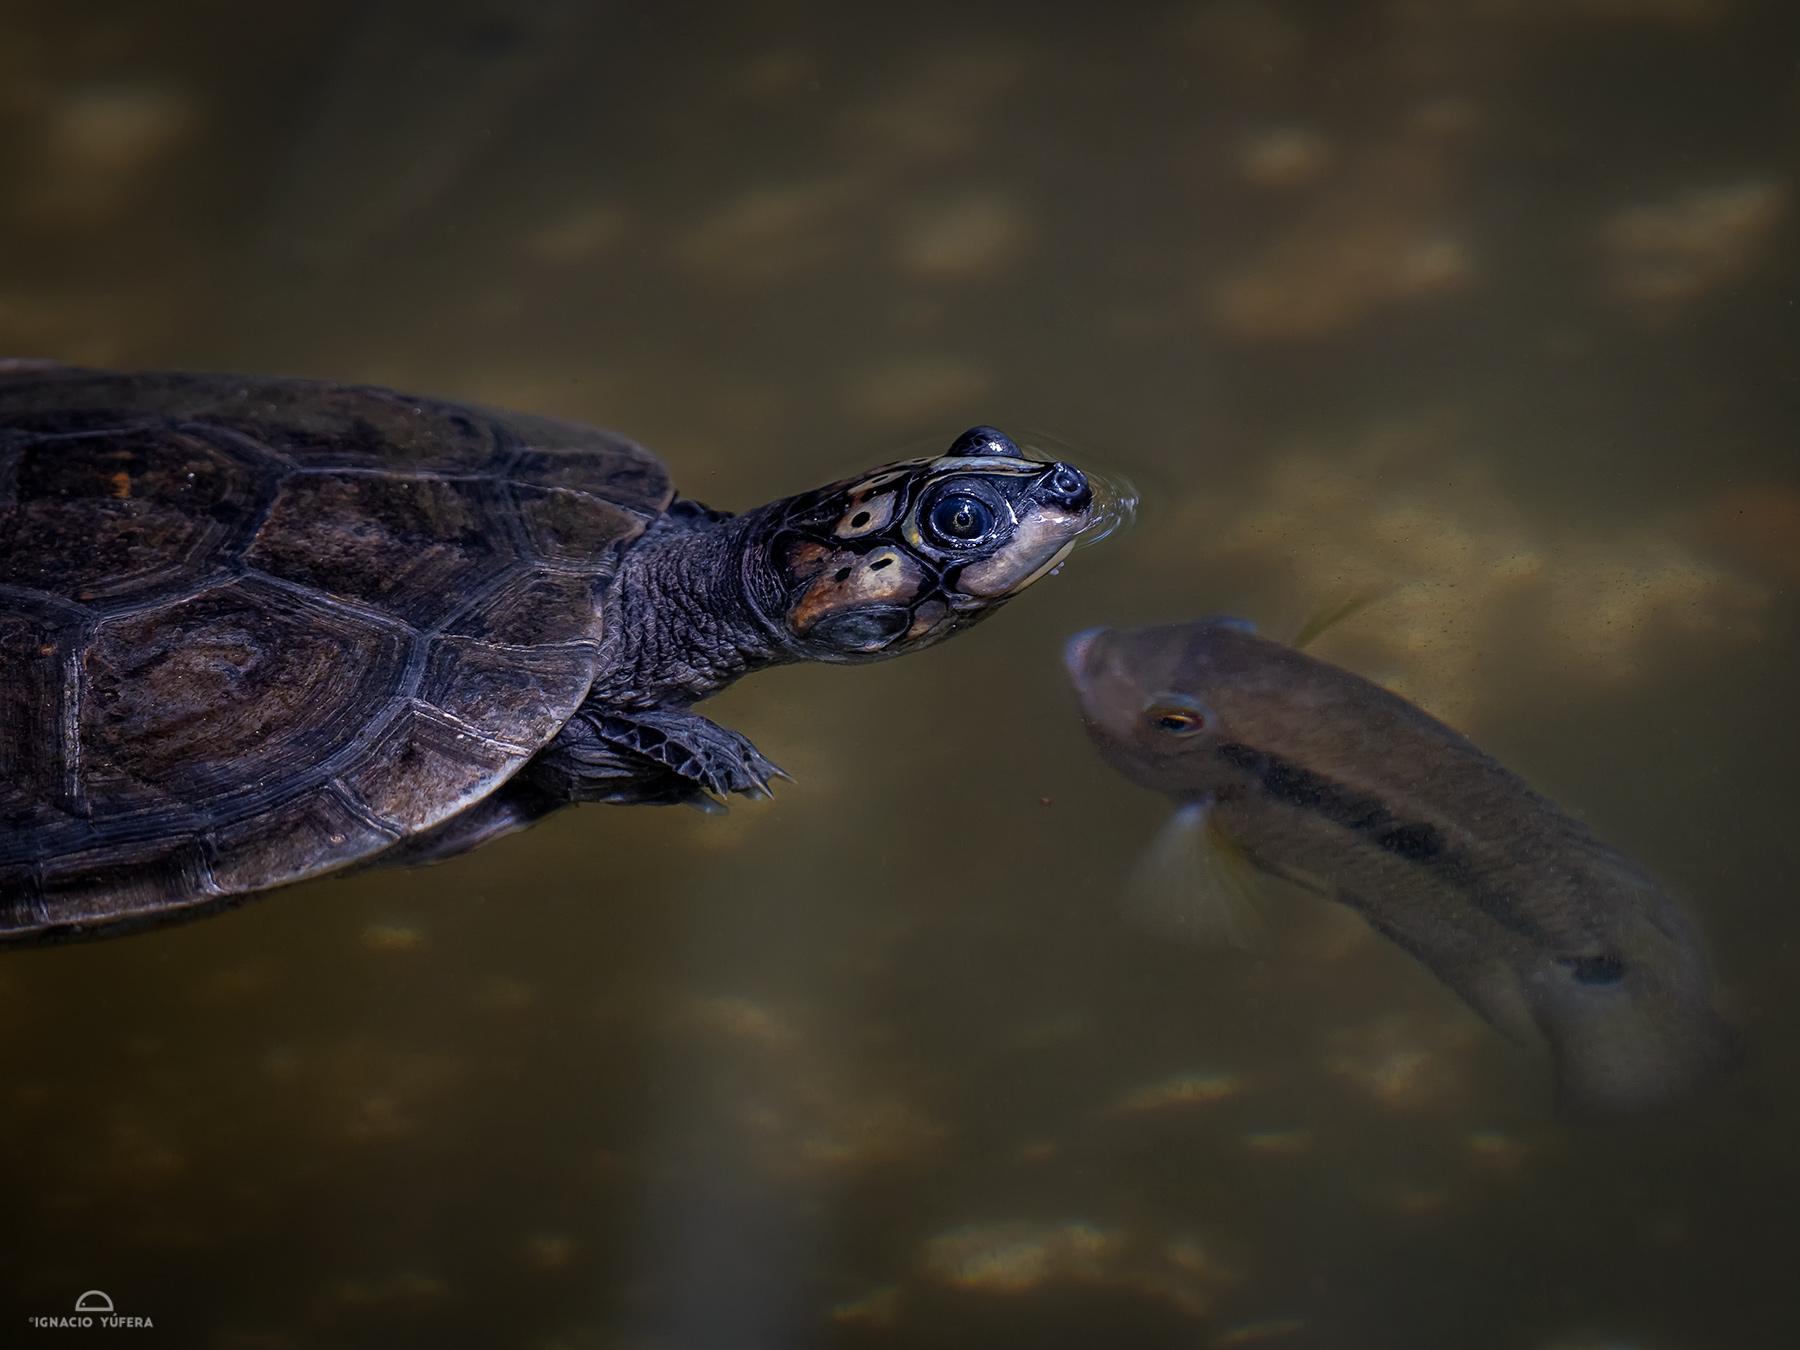 Arrau turtle (Podocnemys expansa), juvenile, Amazonas, Brazil